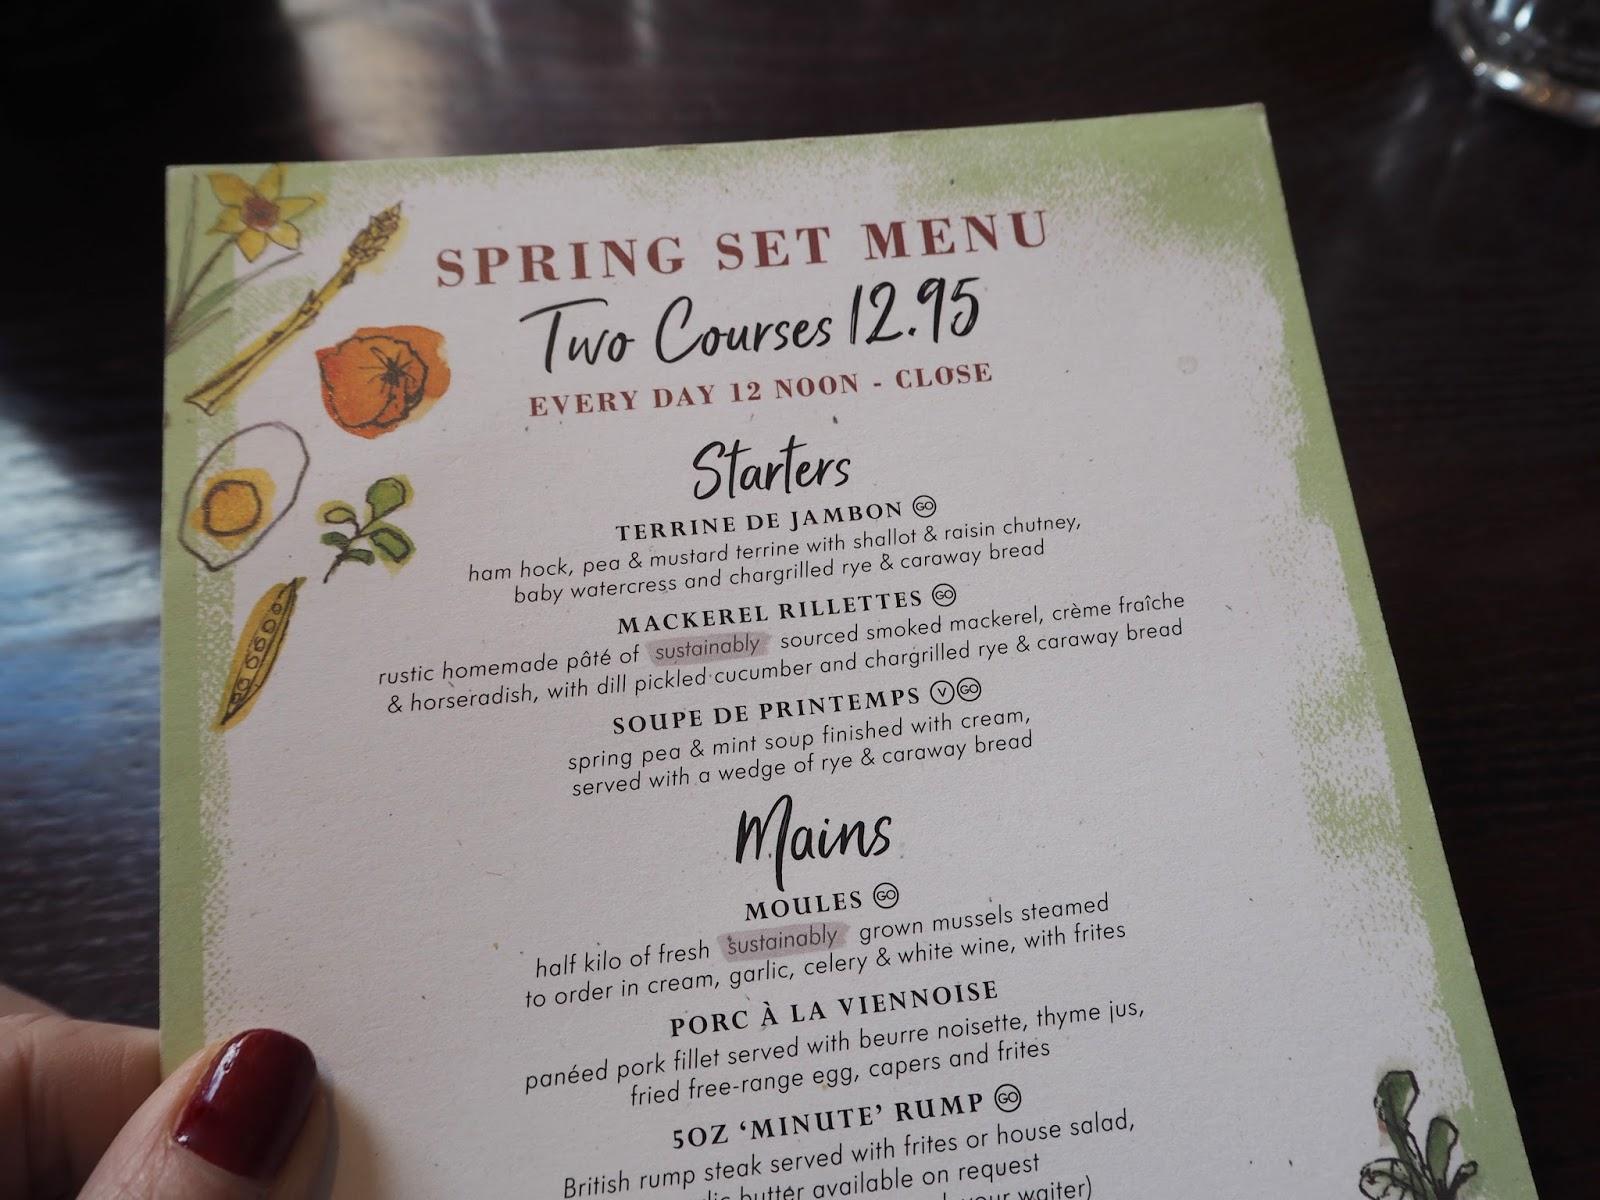 Review of Cafe Rouge spring set menu